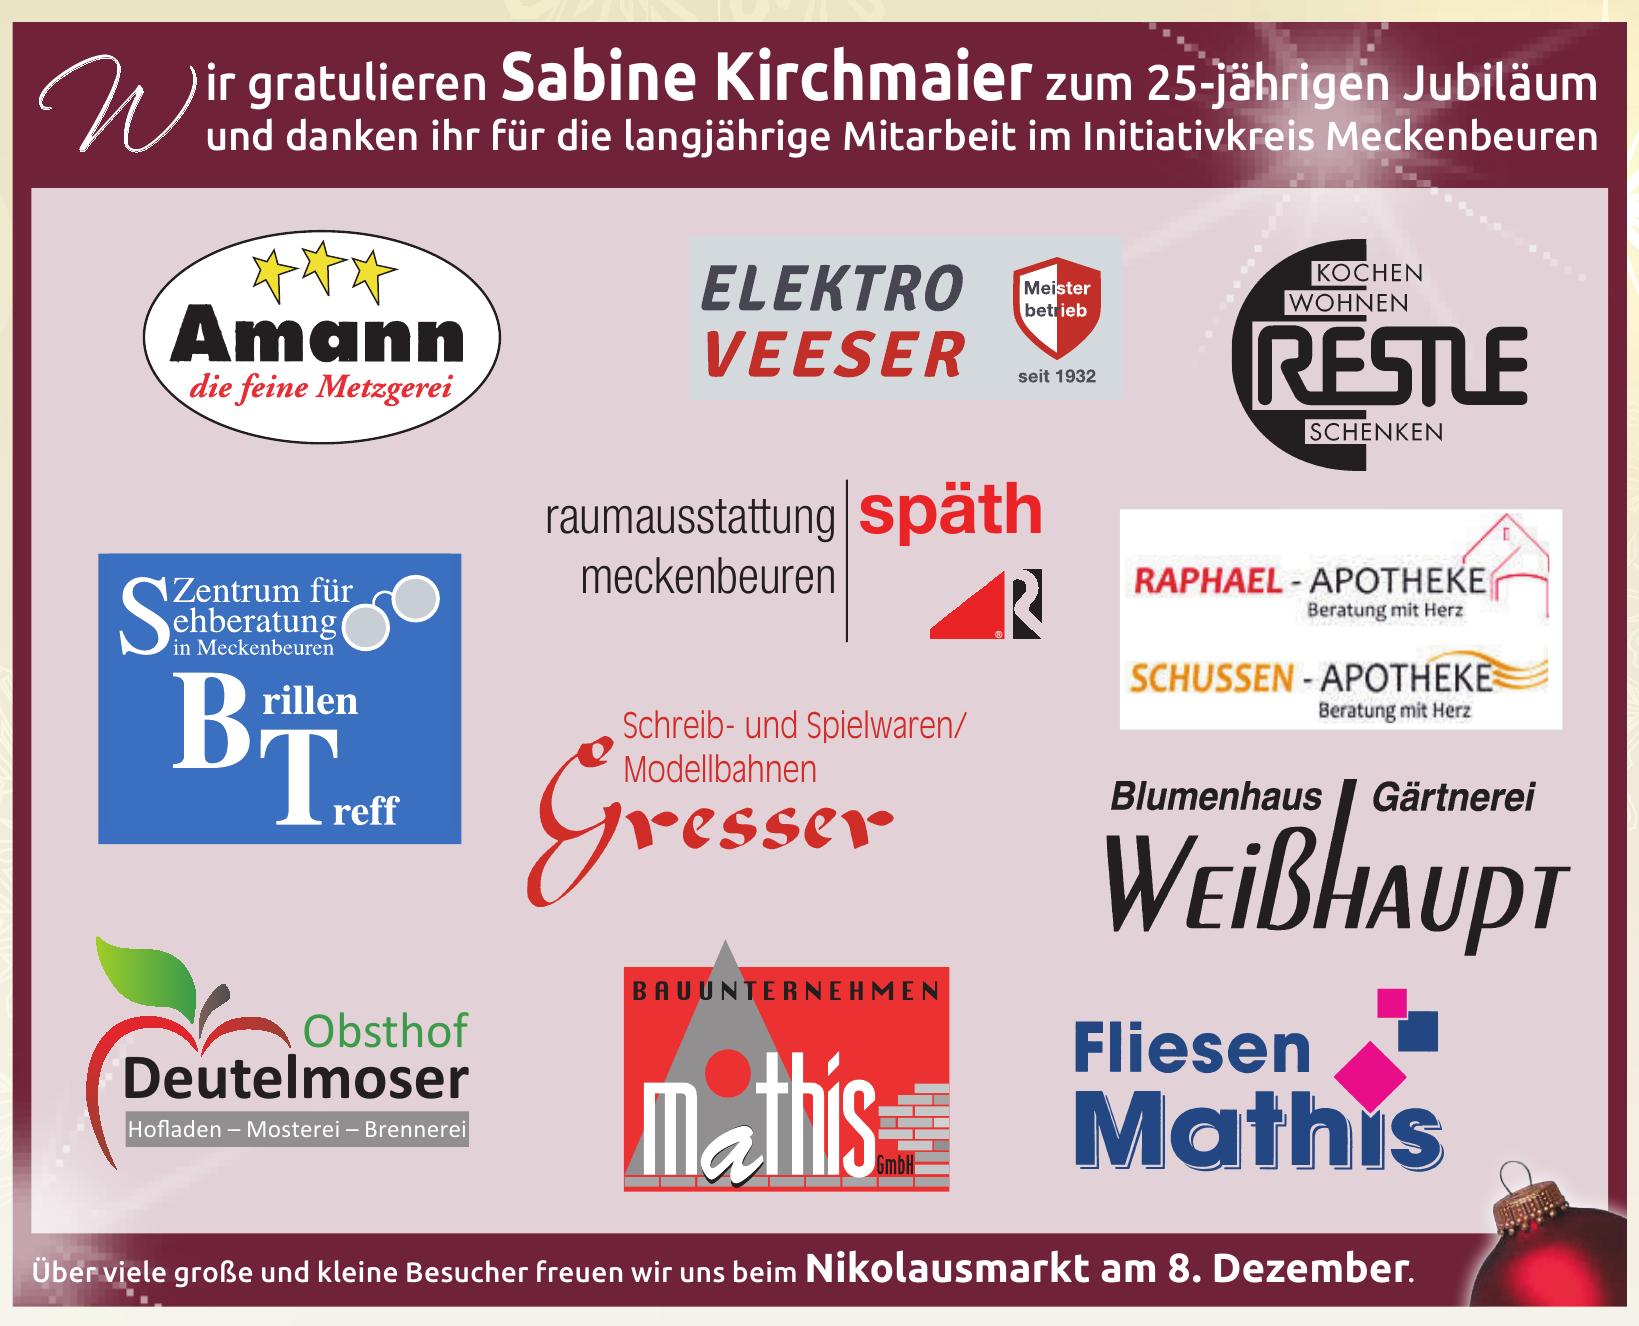 Sabine Kirchmayer